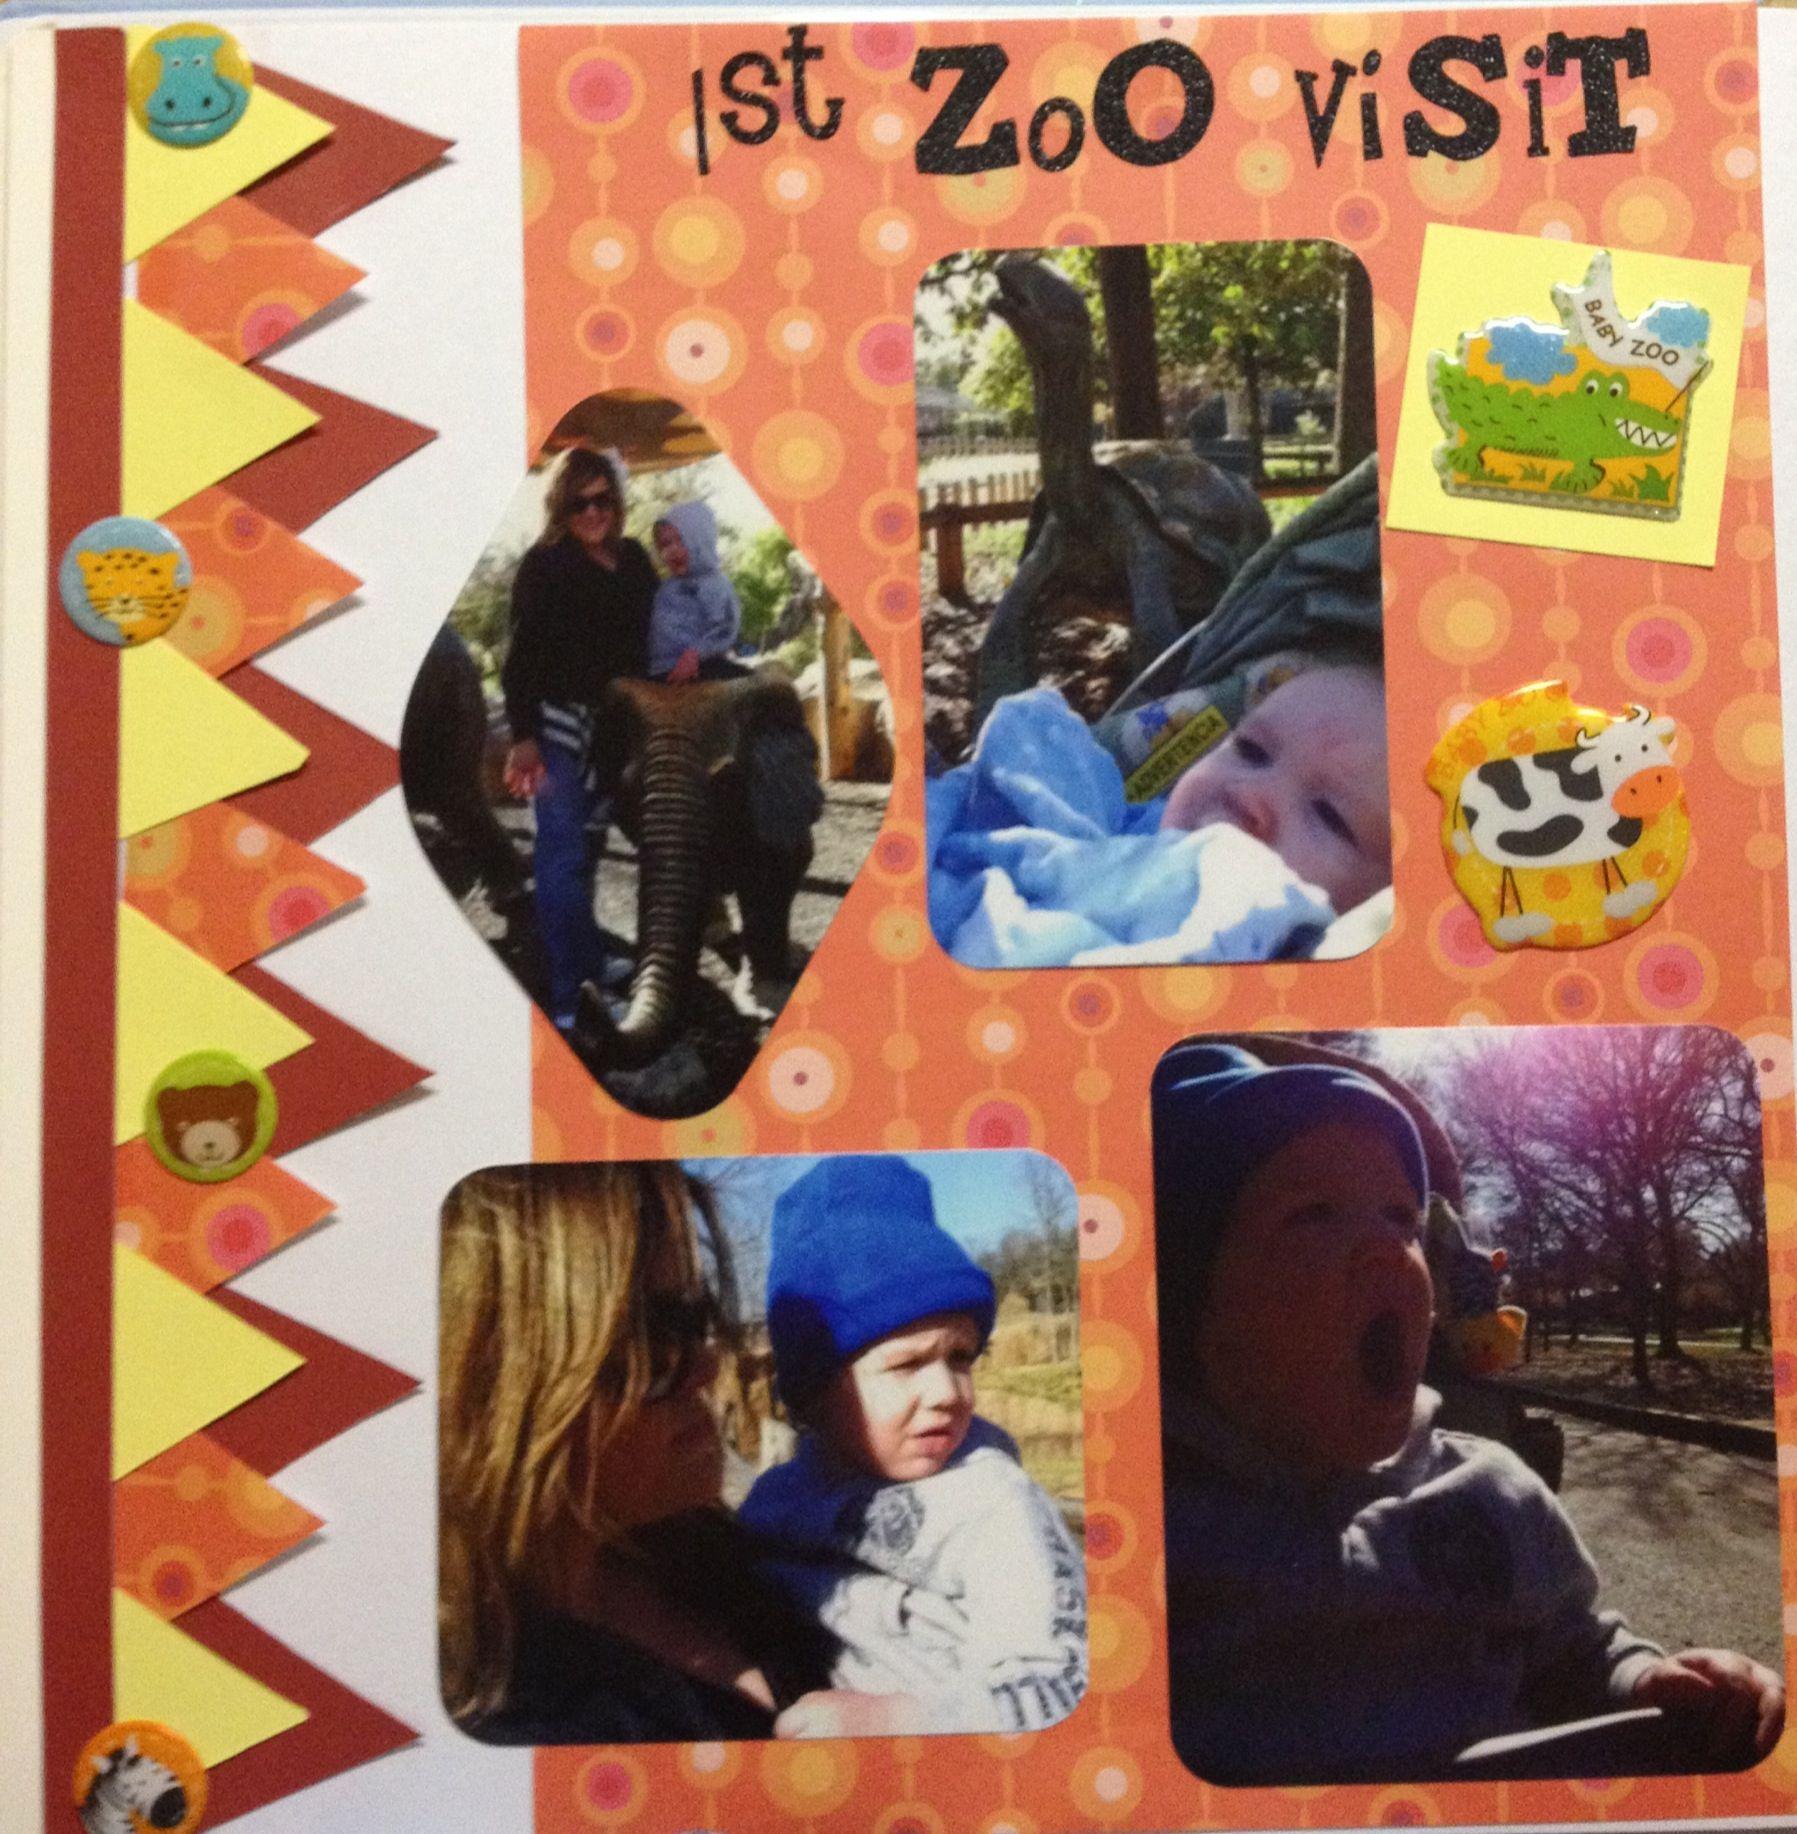 Zoo animal scrapbook ideas - Scrapbook Ideas Animal Scrapbook Zoos Scrapbook First Trip To Zoo Scrapbooking Page Scrapbook Ideas Animal Scrapbook Zoos Scrapbook